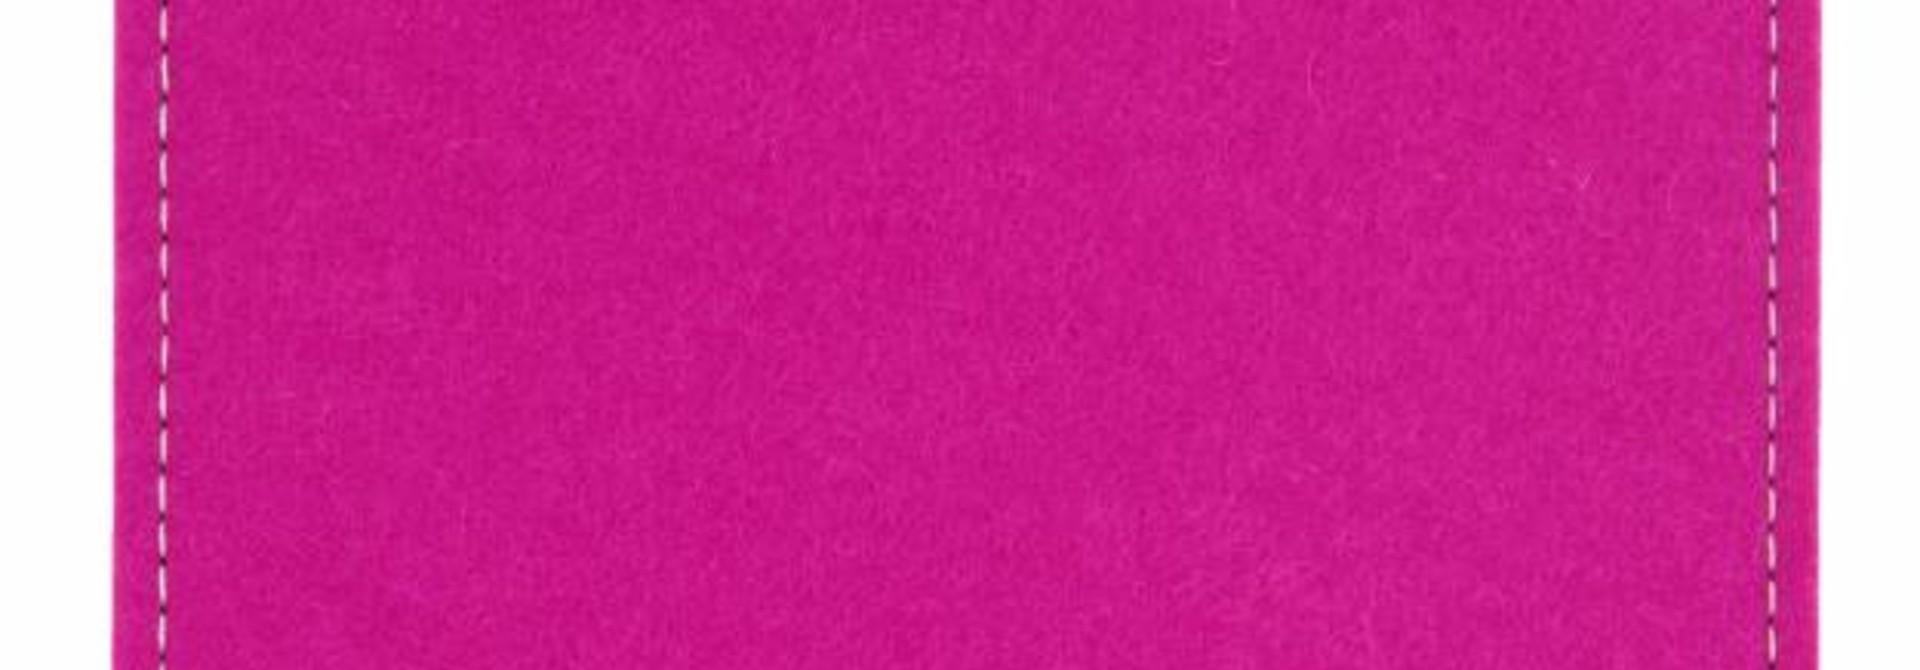 Tablet Sleeve Pink